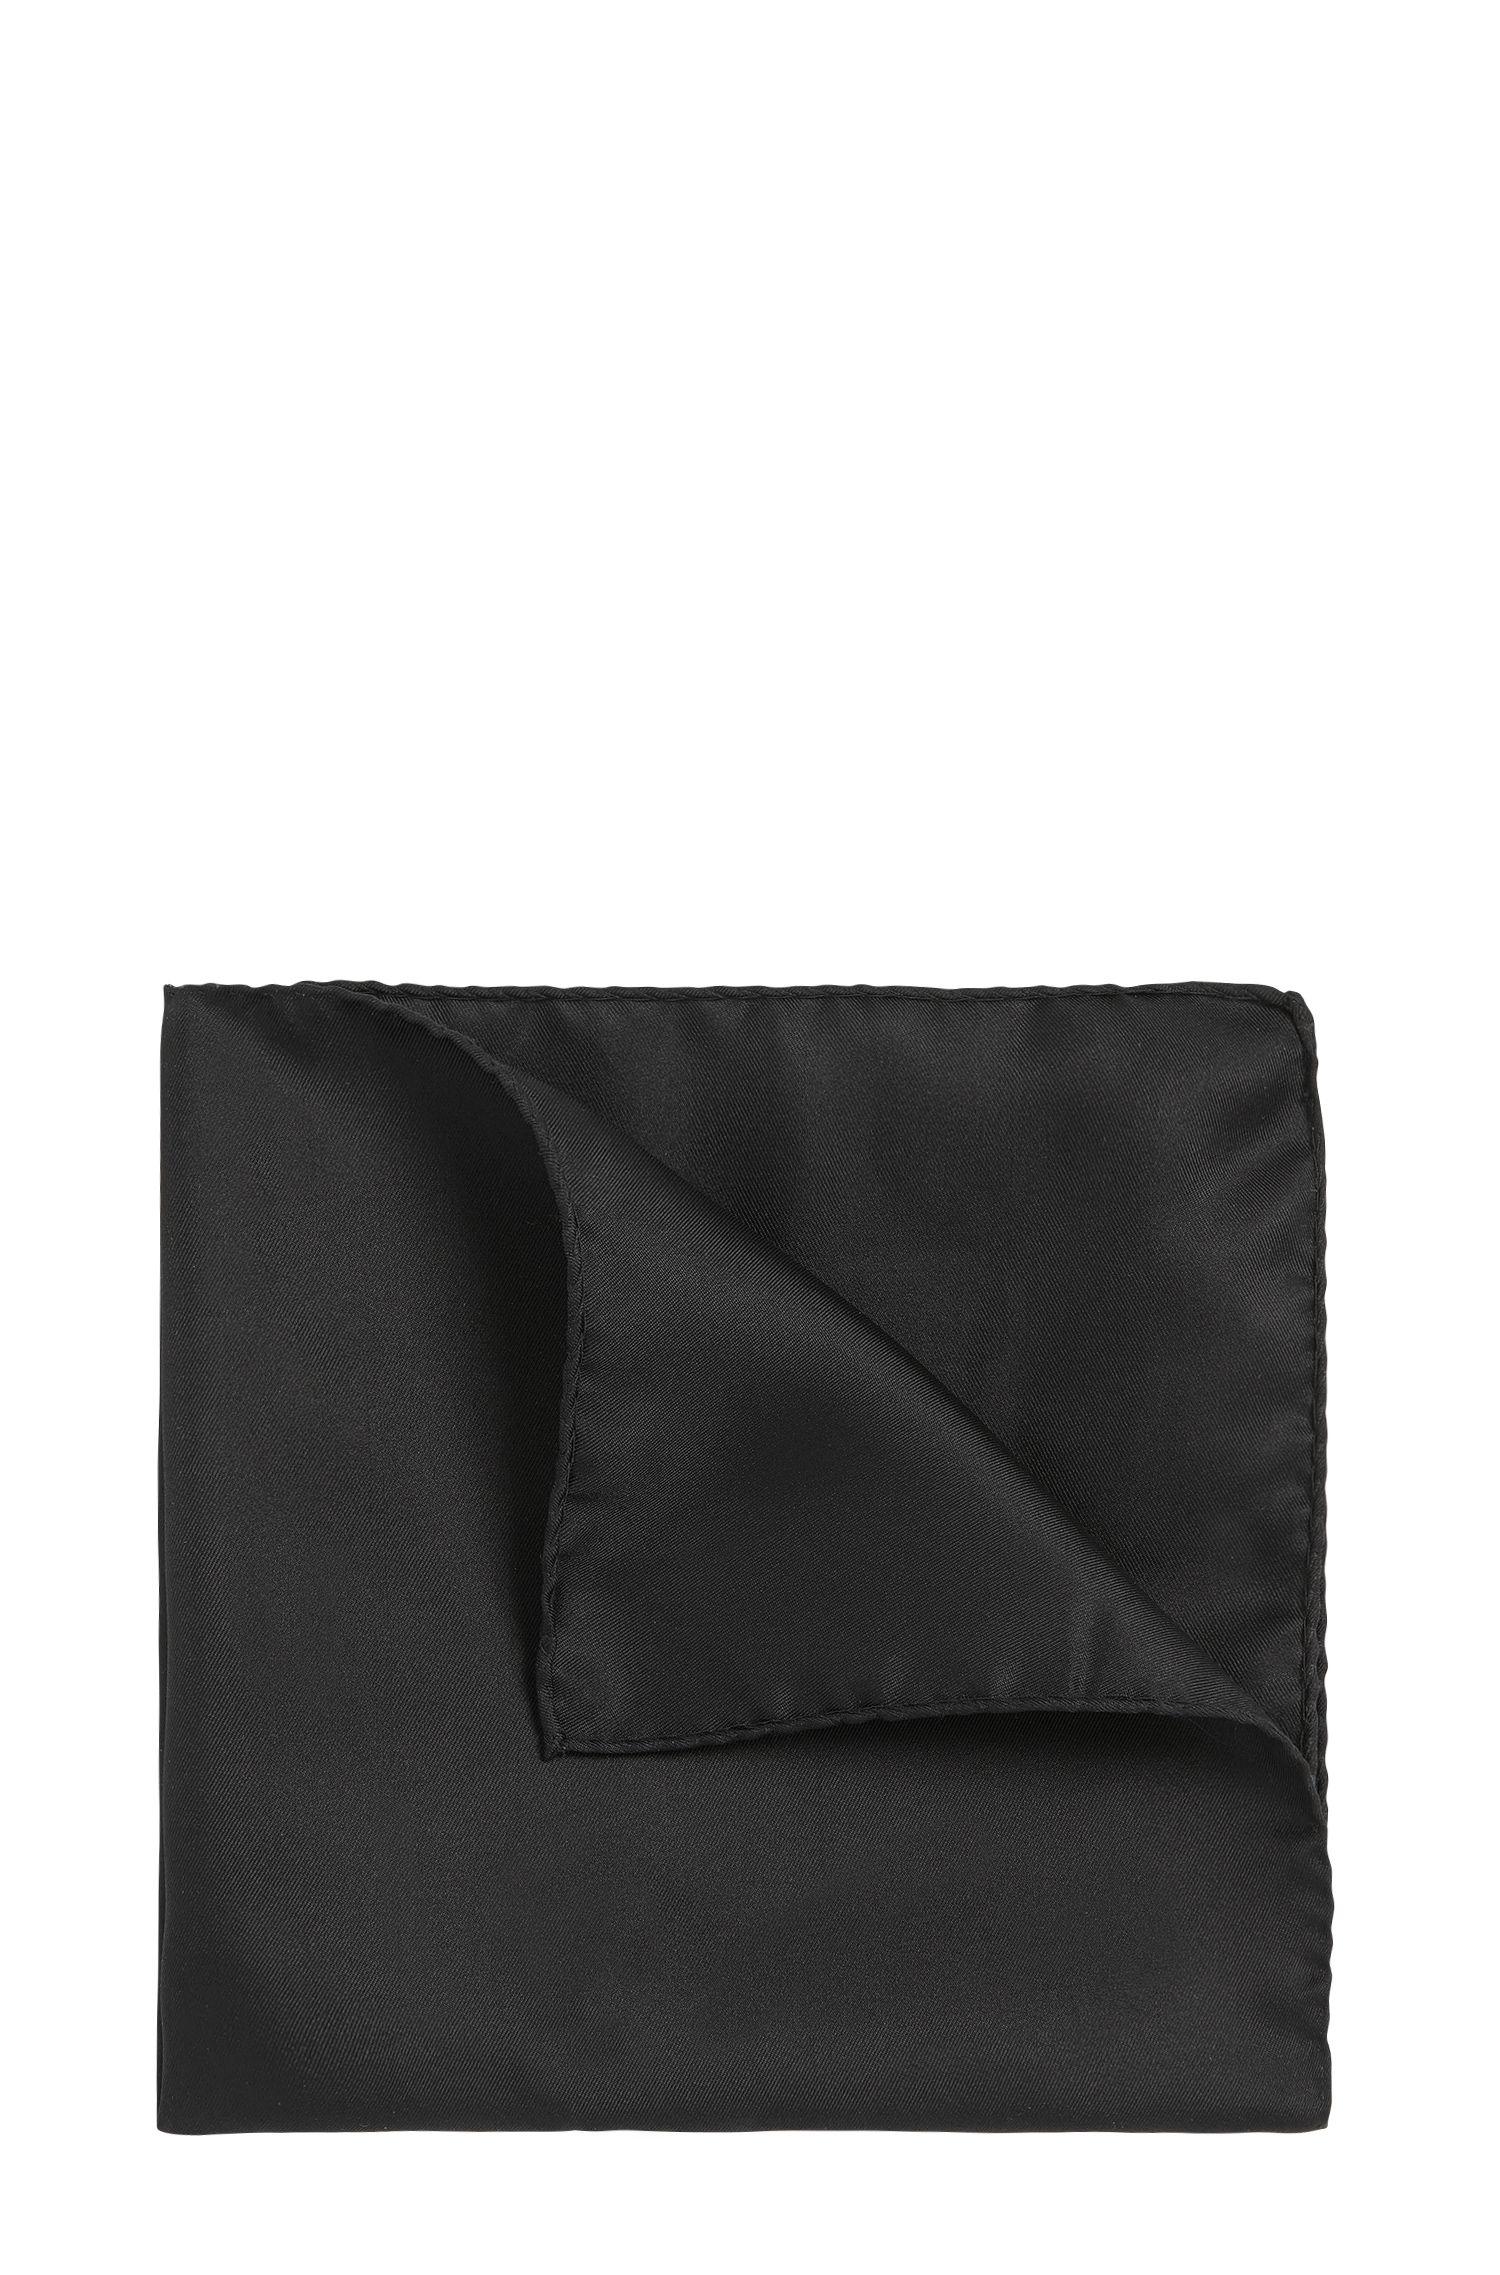 Effen pochet van zuivere zijde: 'Pocketsquare 33x33cm'